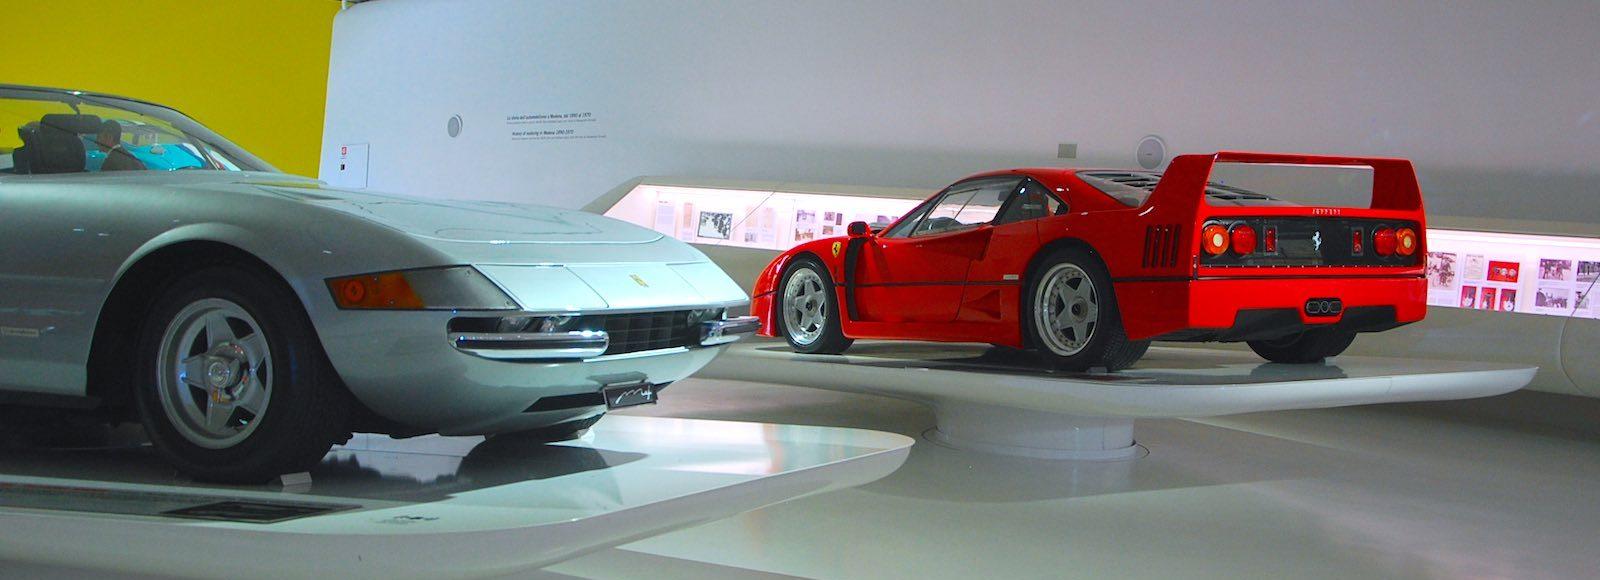 Ferrari Enzo Museum Modena Banner